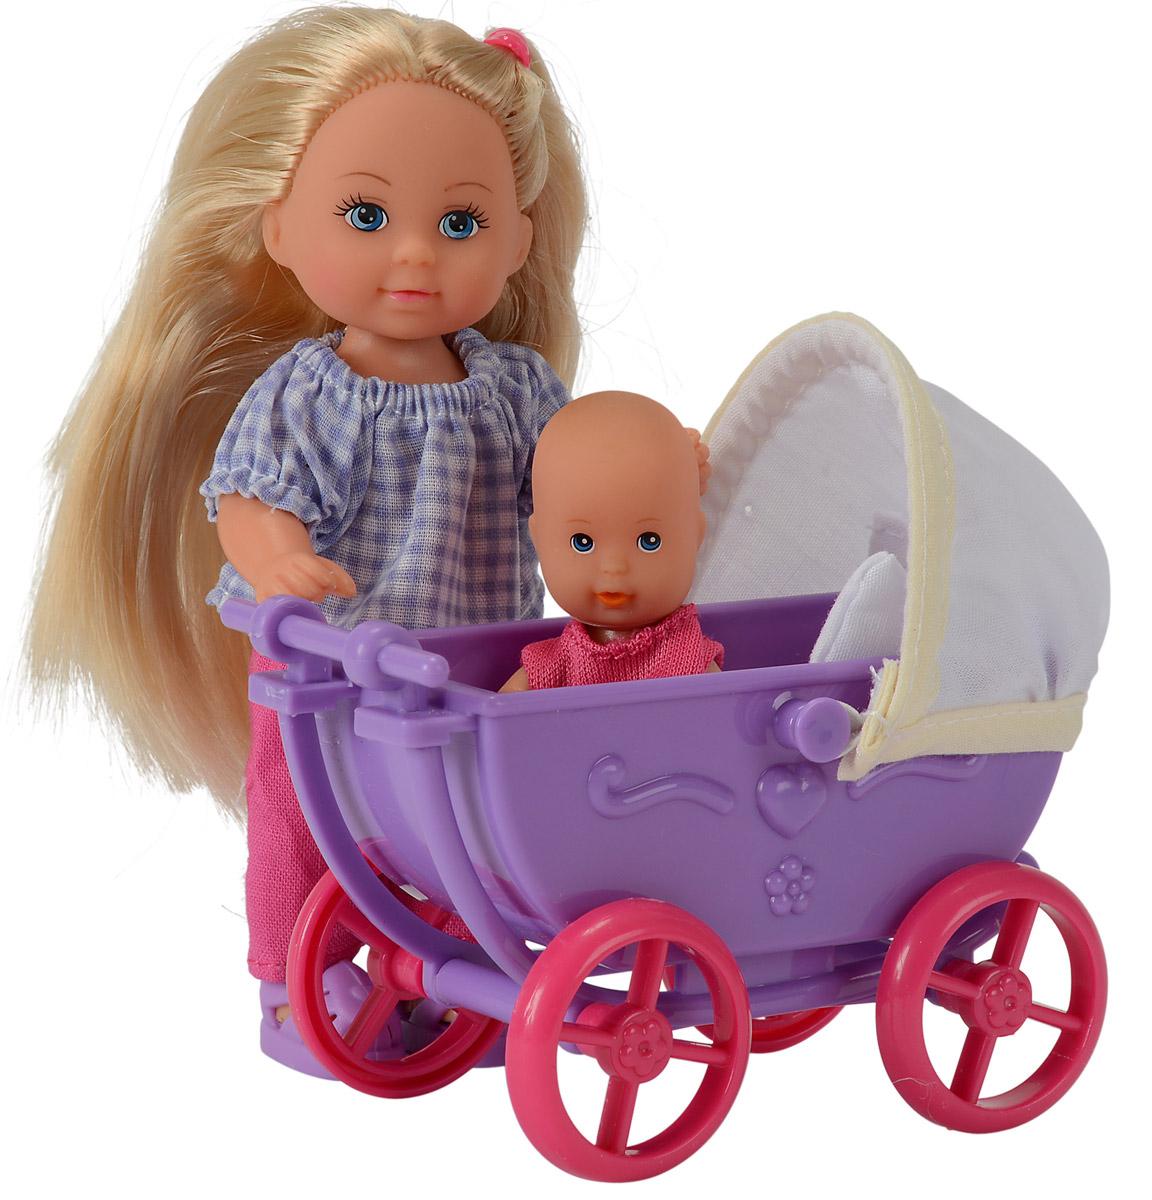 Simba Кукла Еви в брюках с малышом 5736241 simba кукла evi